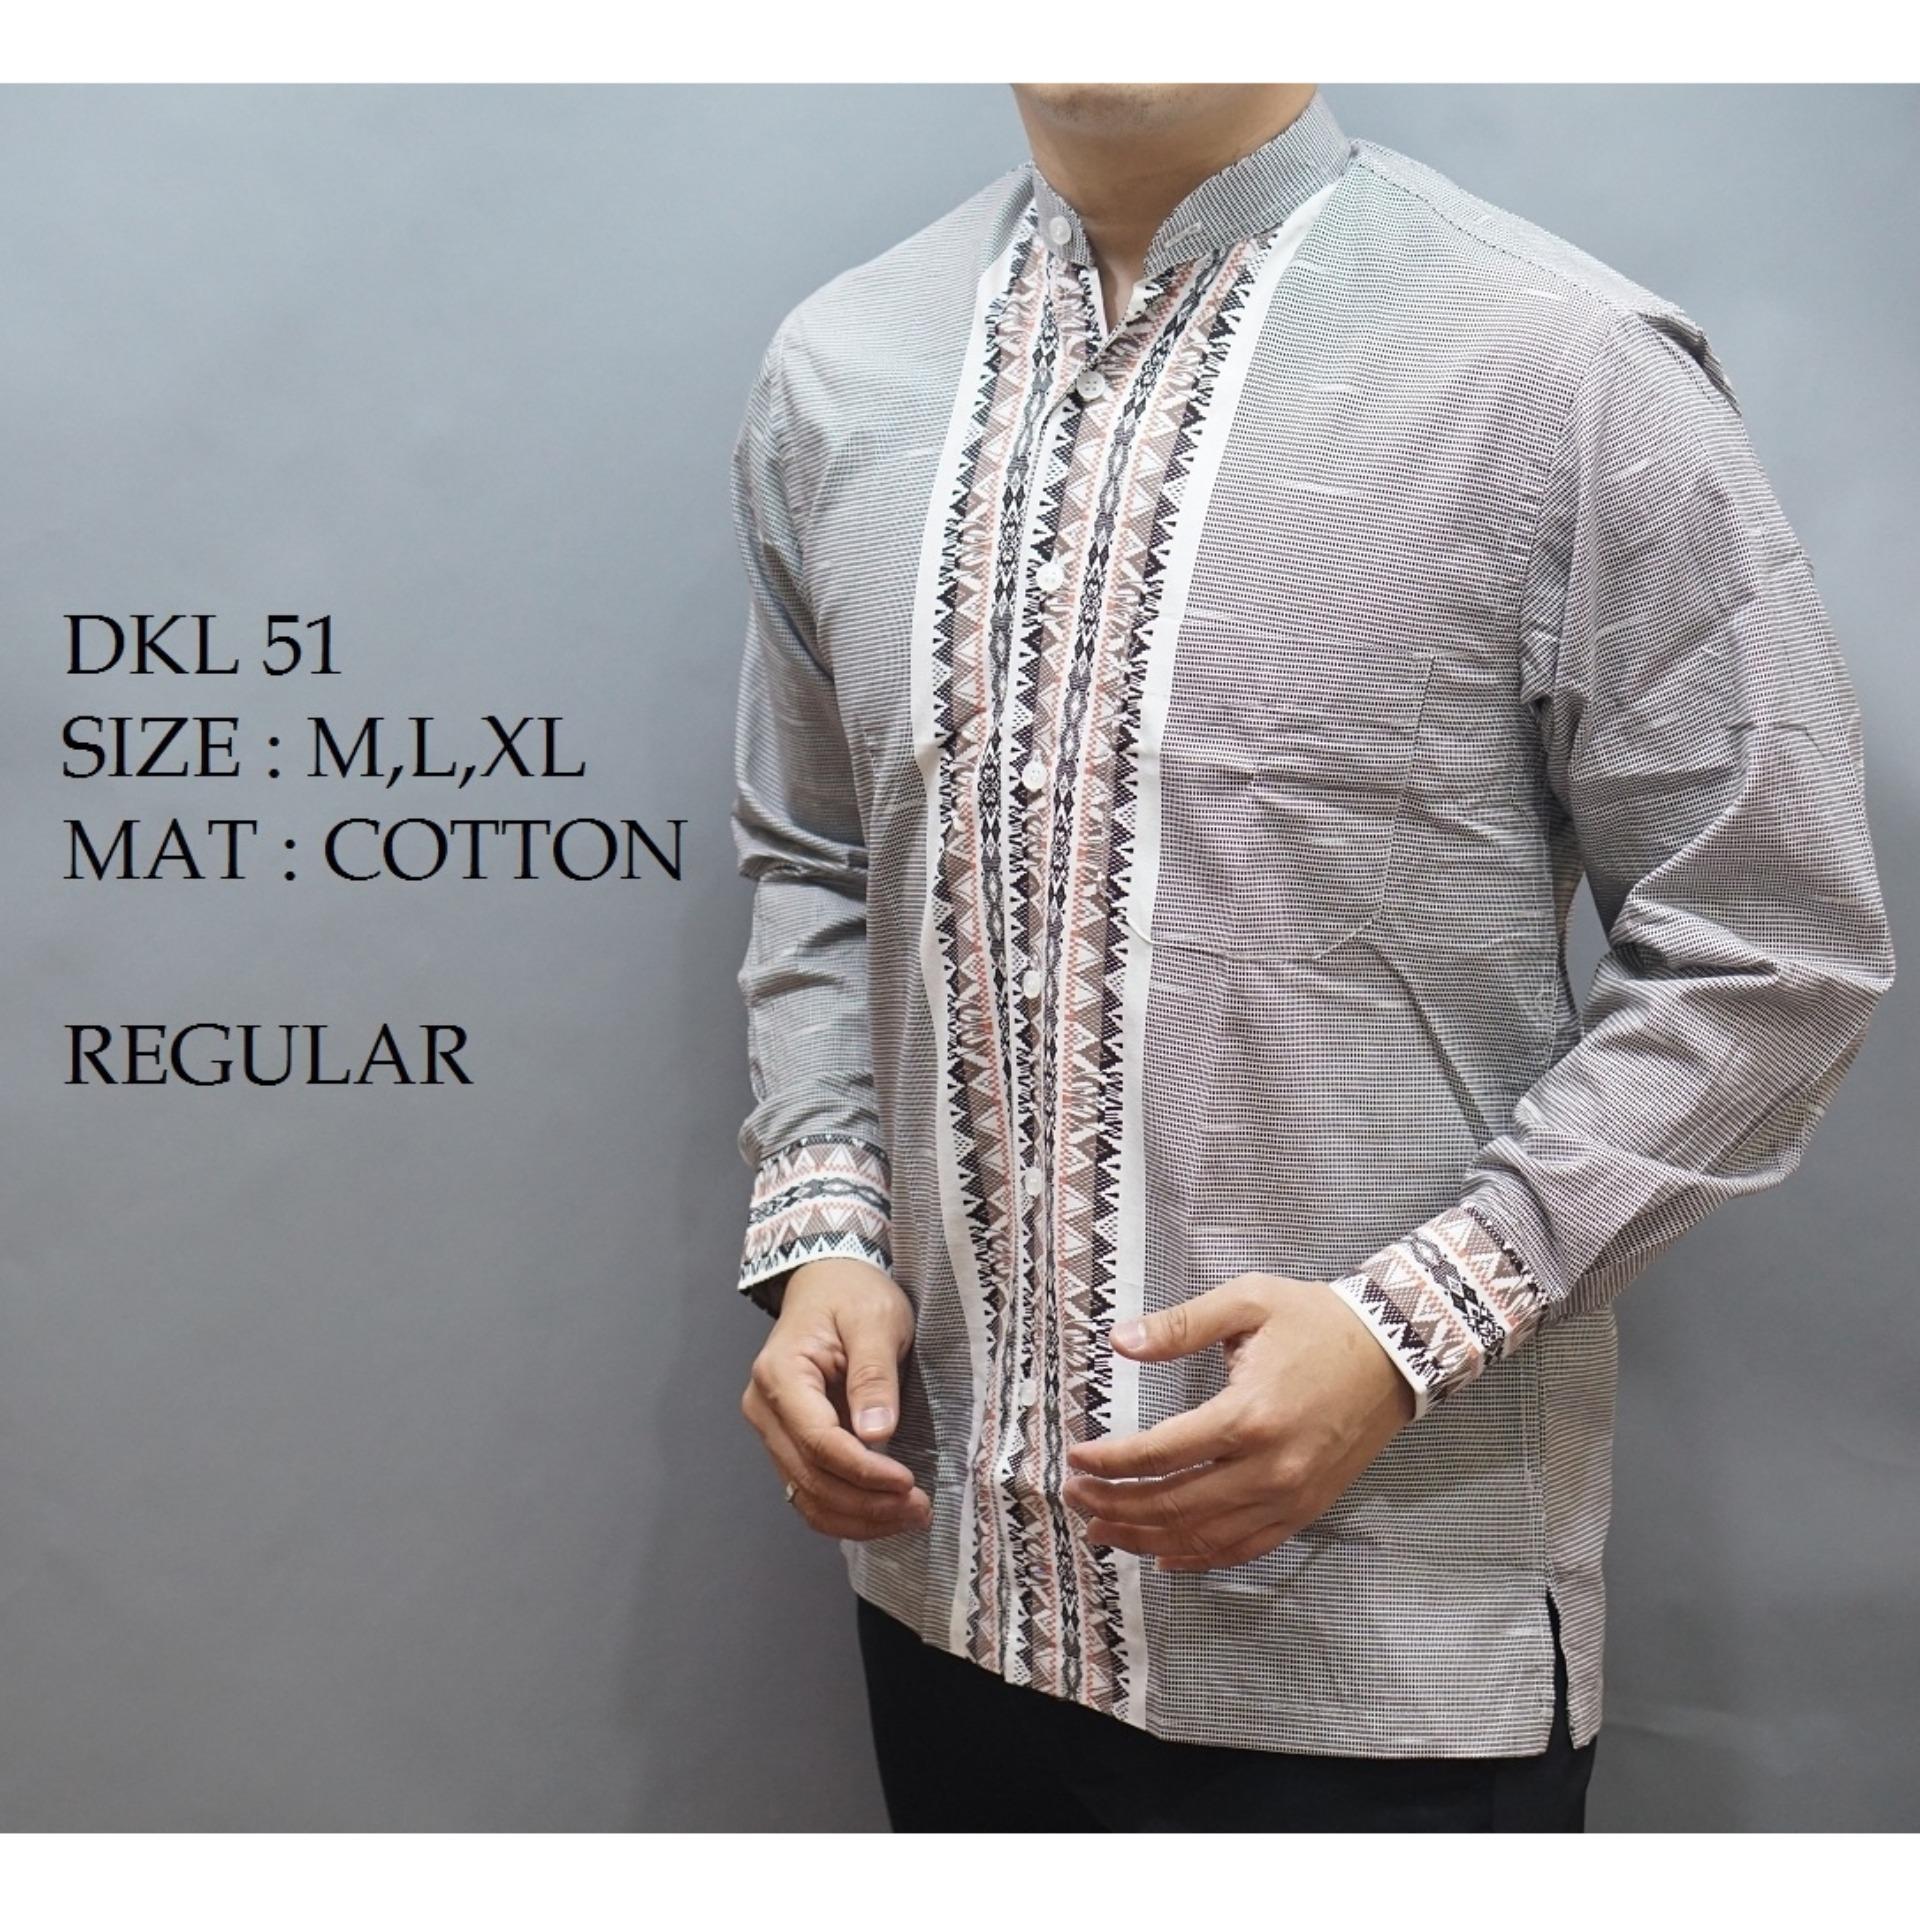 Baju Kemeja KOKO Pria / Baju Muslim Pria / Koko Modern / Busana Muslim